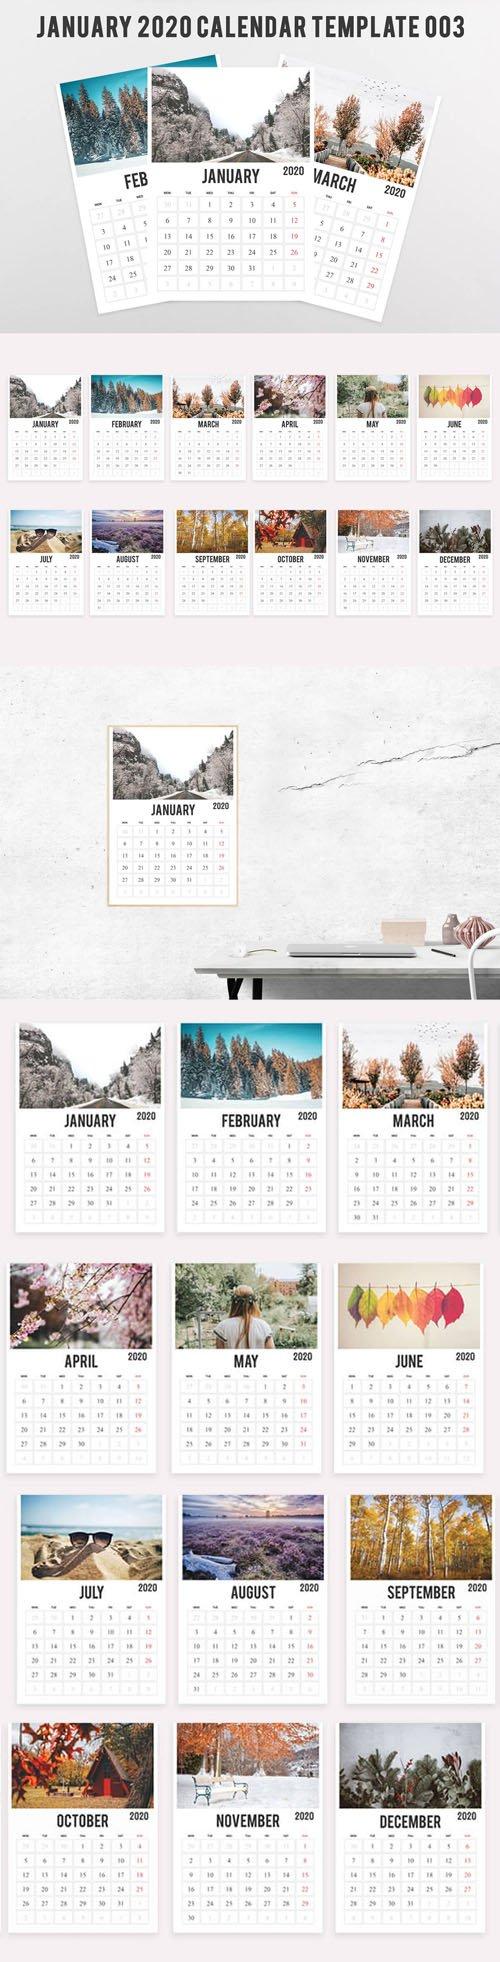 2020 Calendar Printable PSD Template [12-Months]